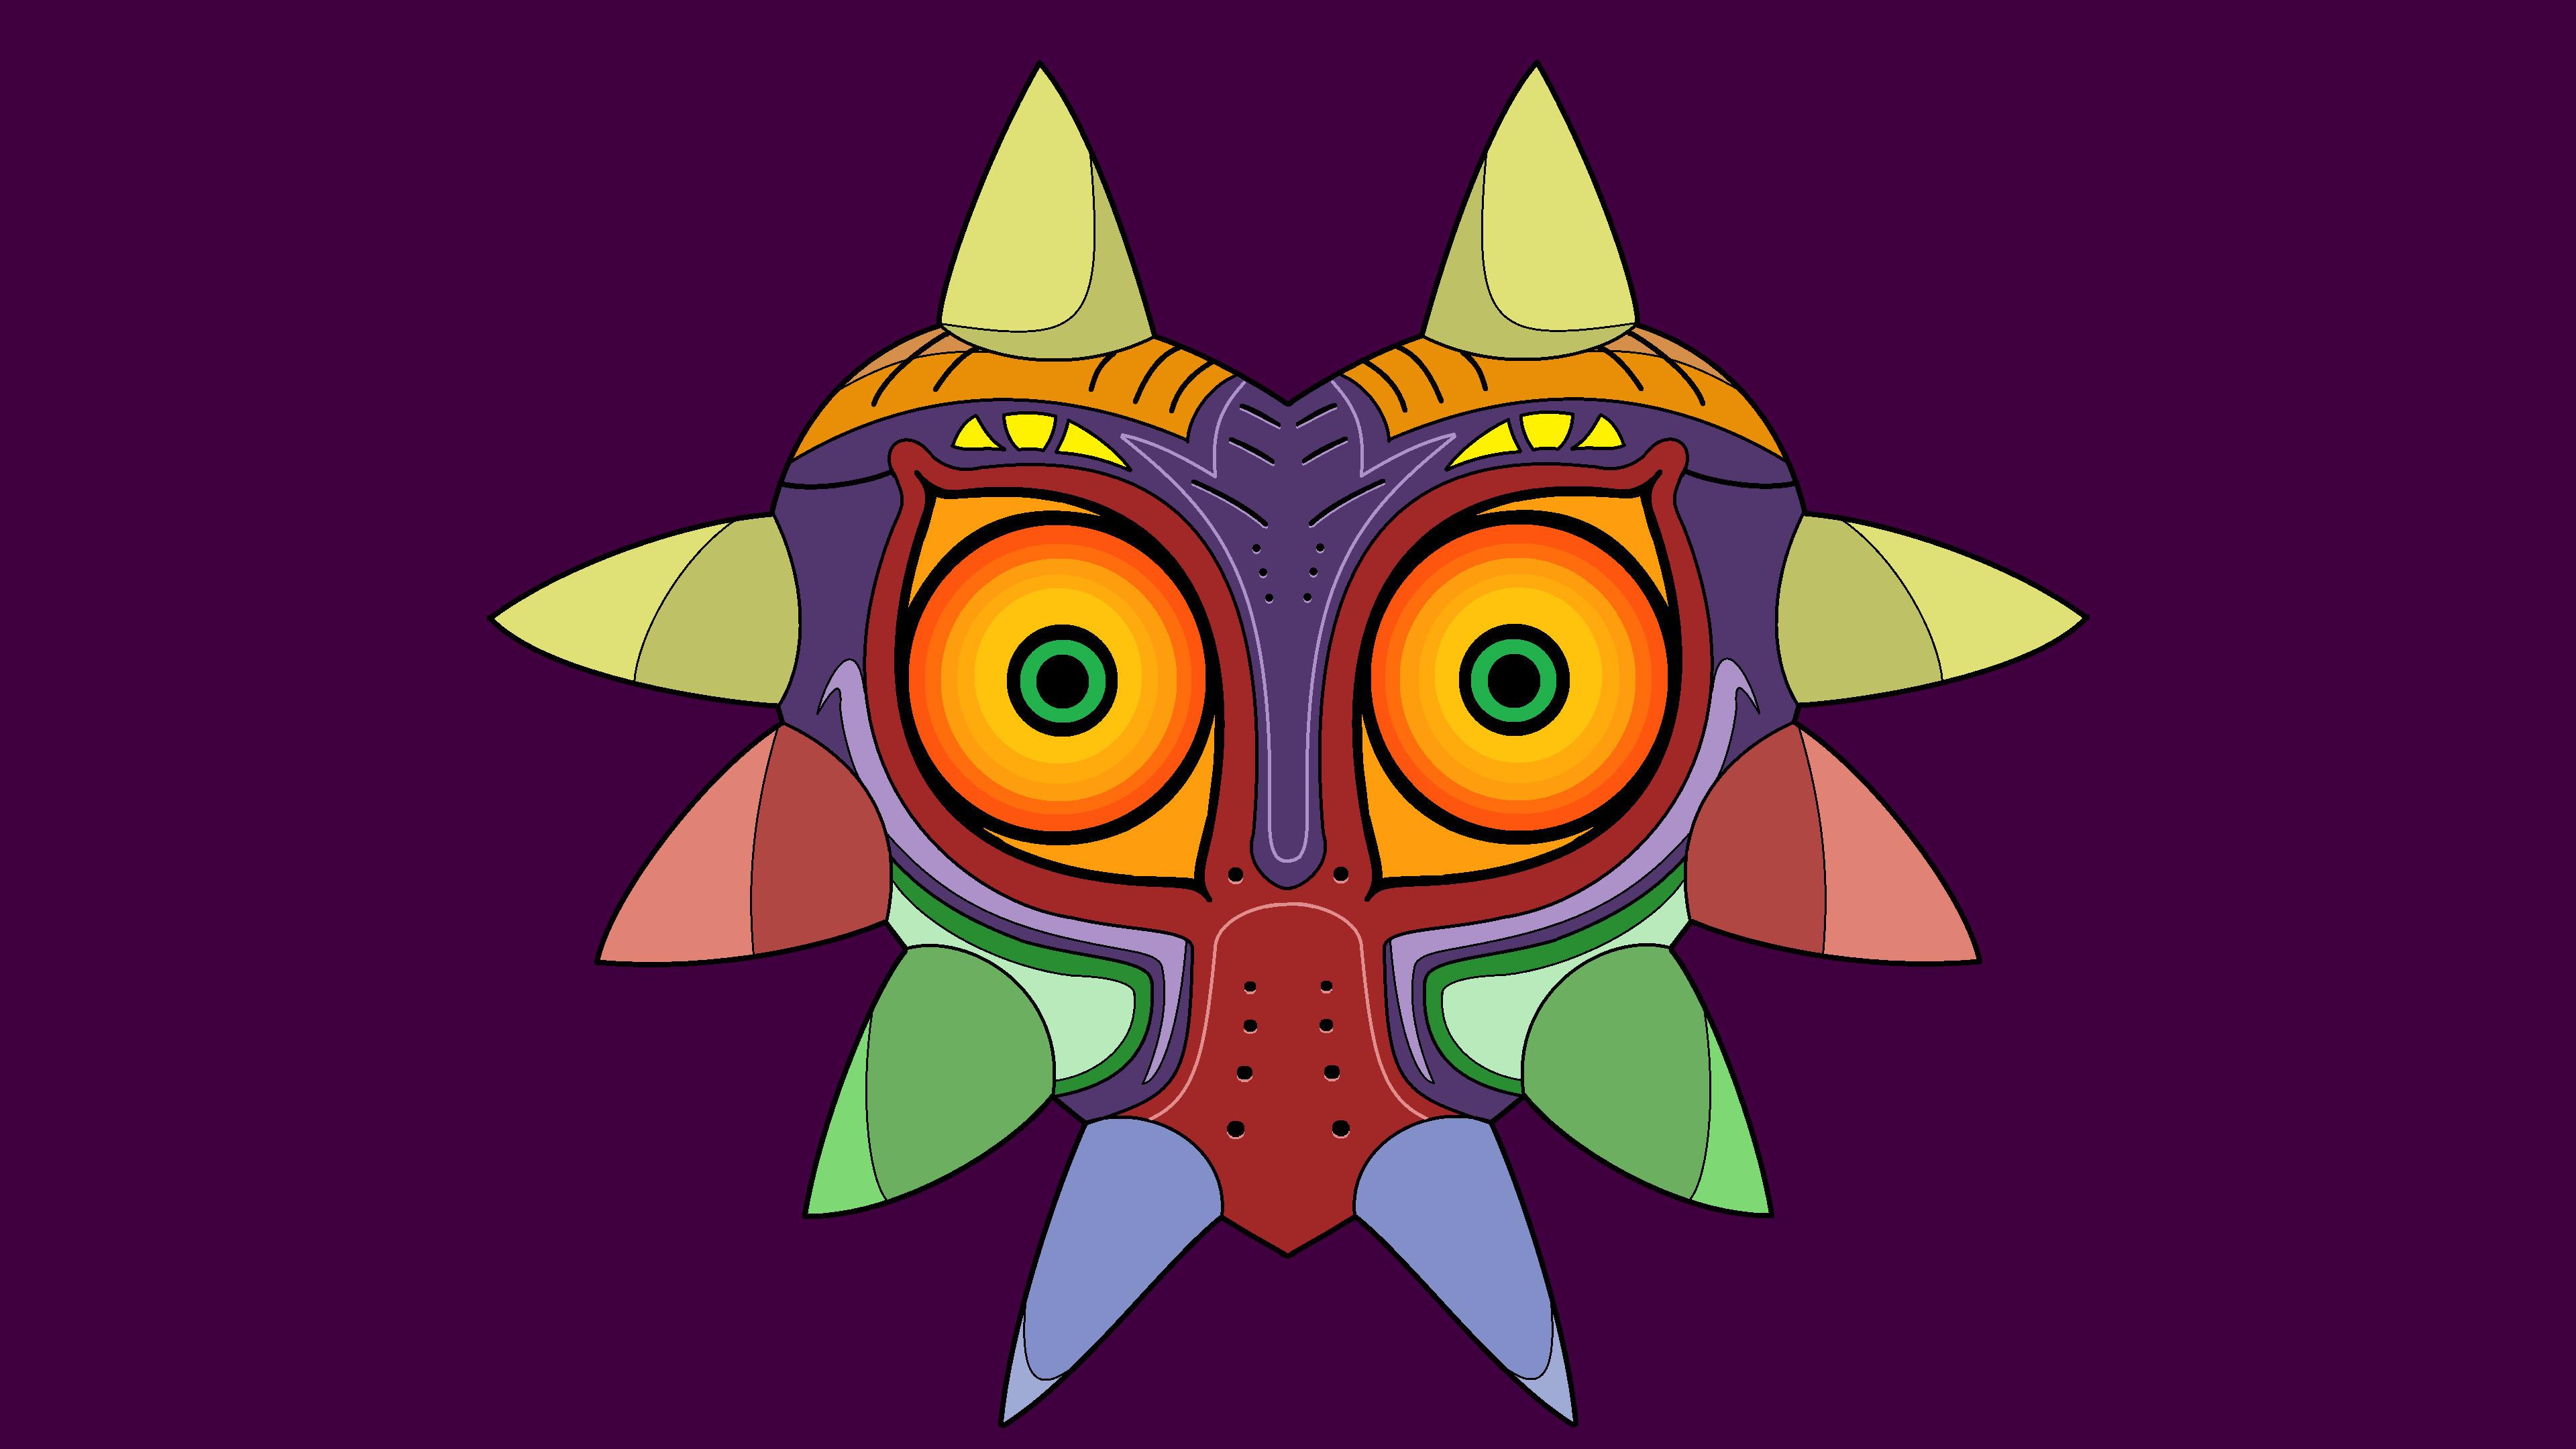 … Majora's Mask Wallpaper (version 2) by thefish95